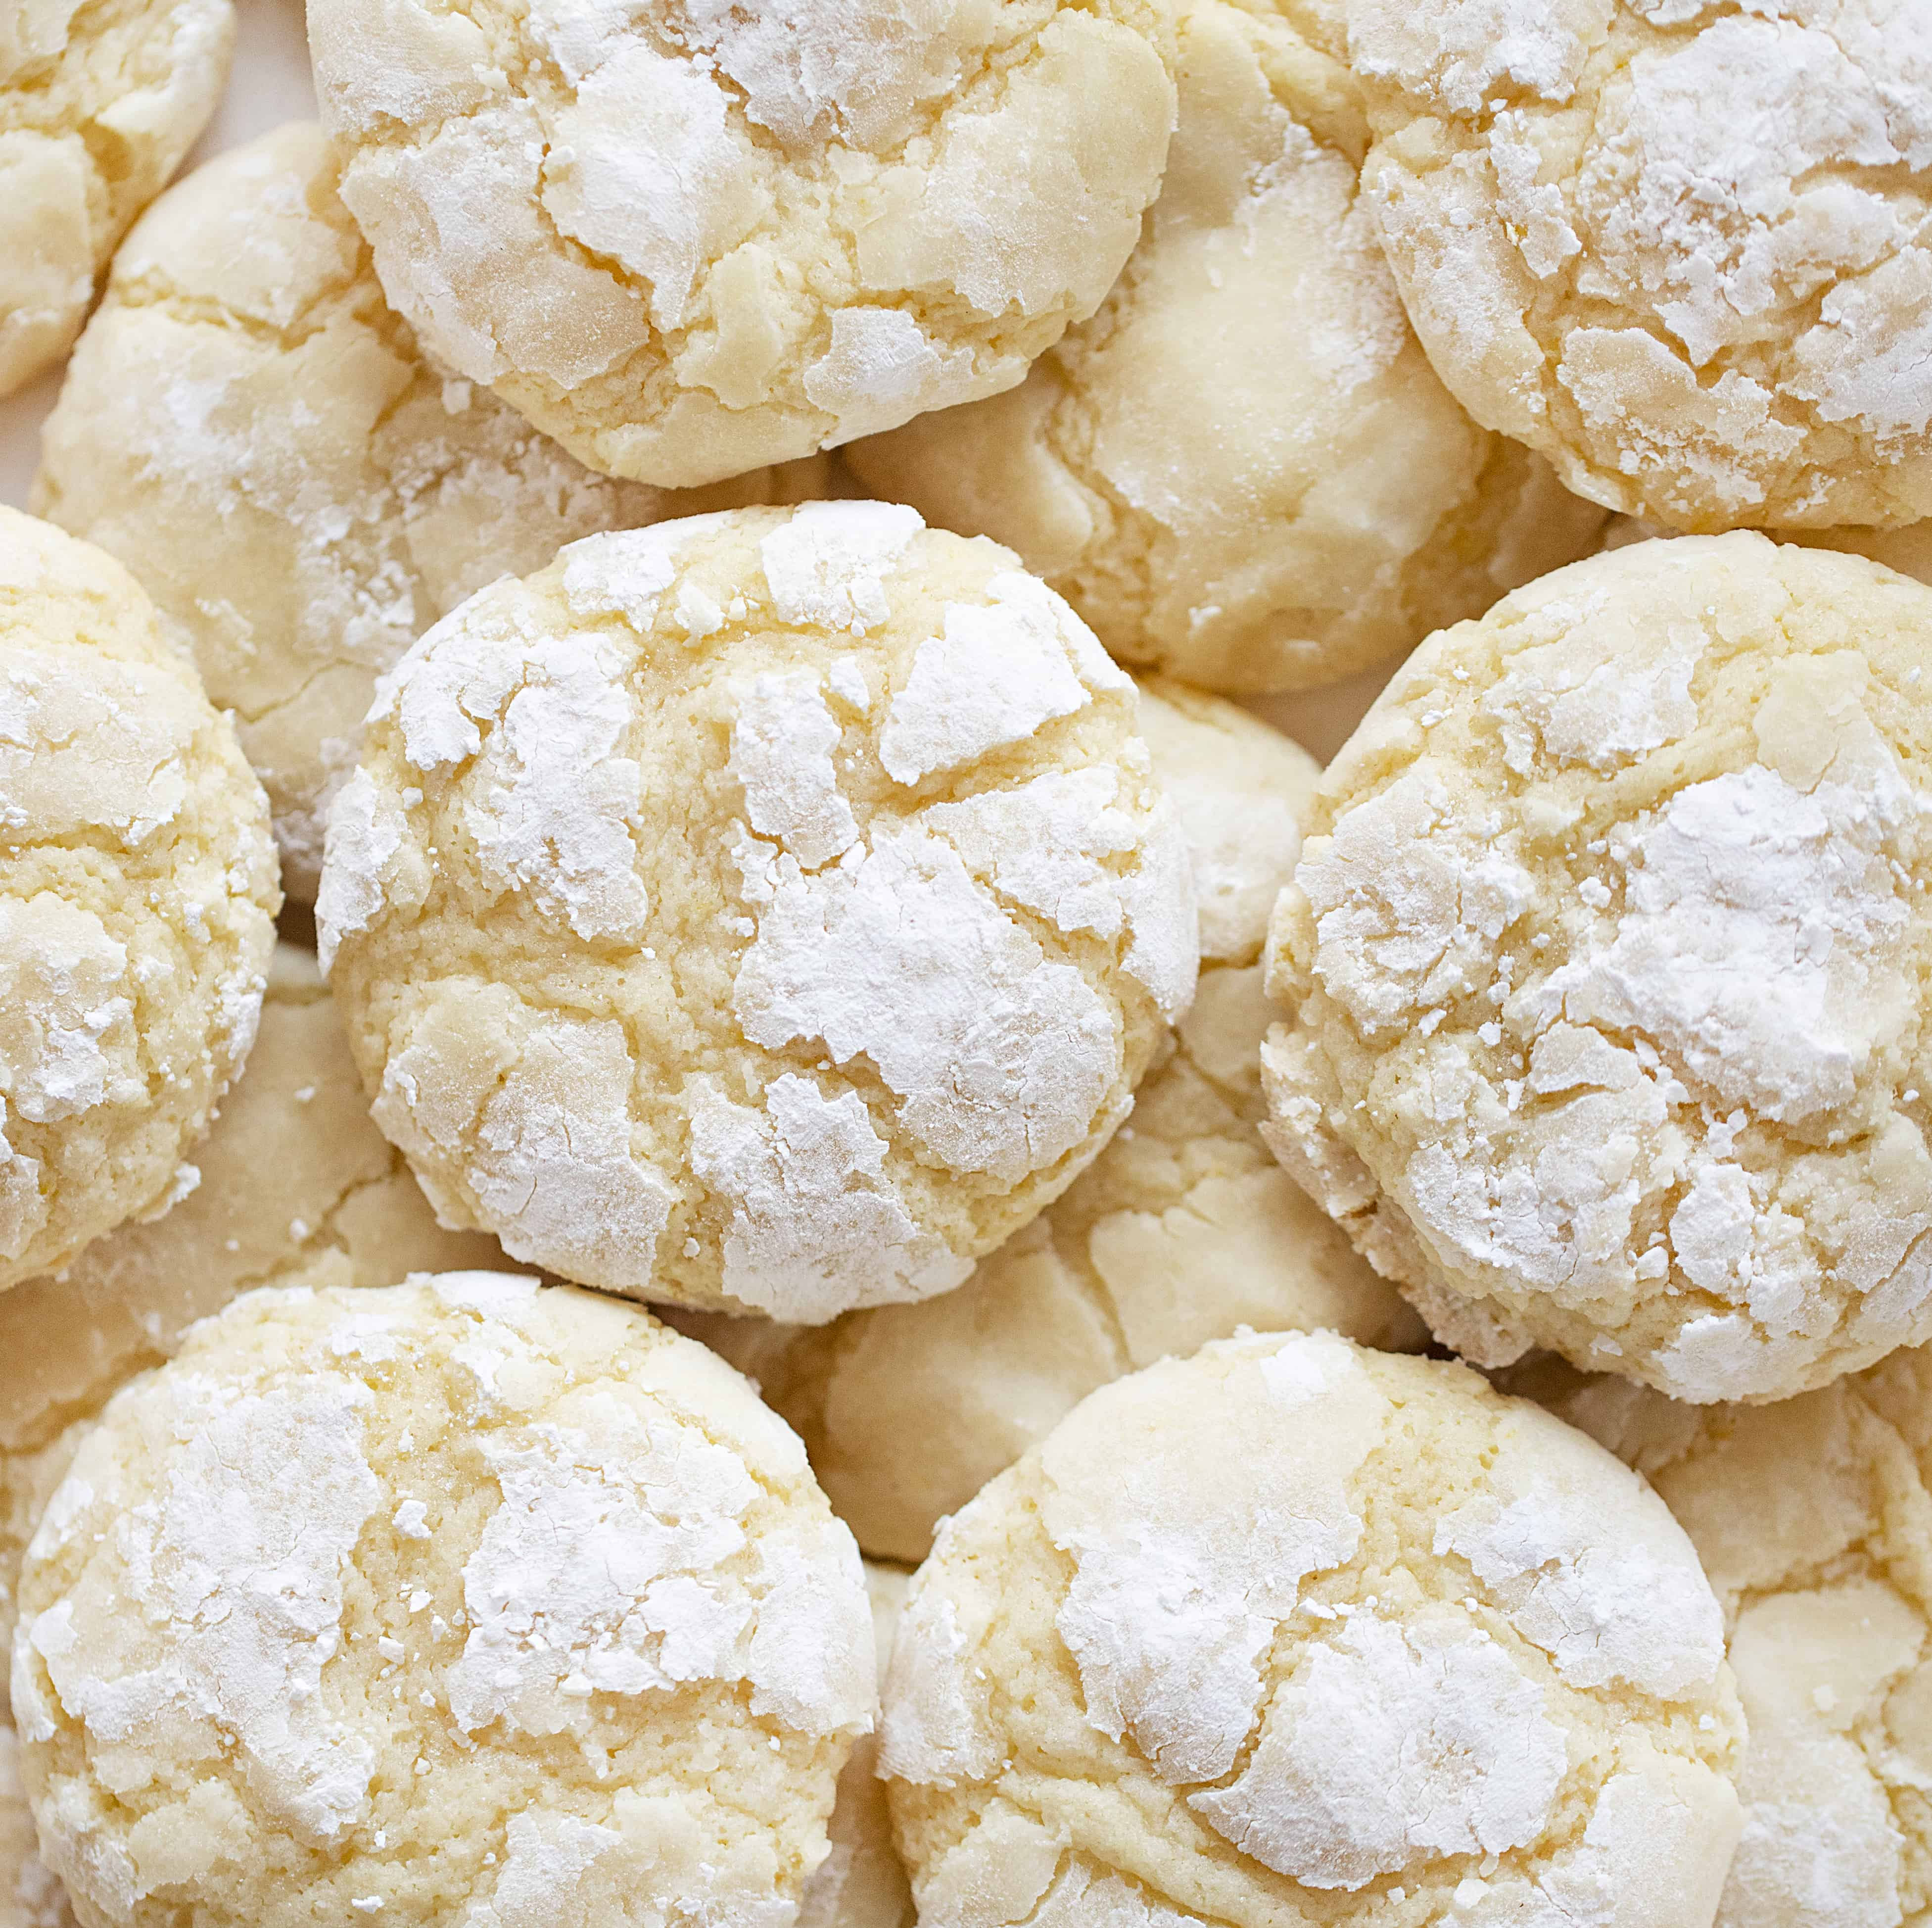 How to Make Ooey Gooey Lemon Cookies